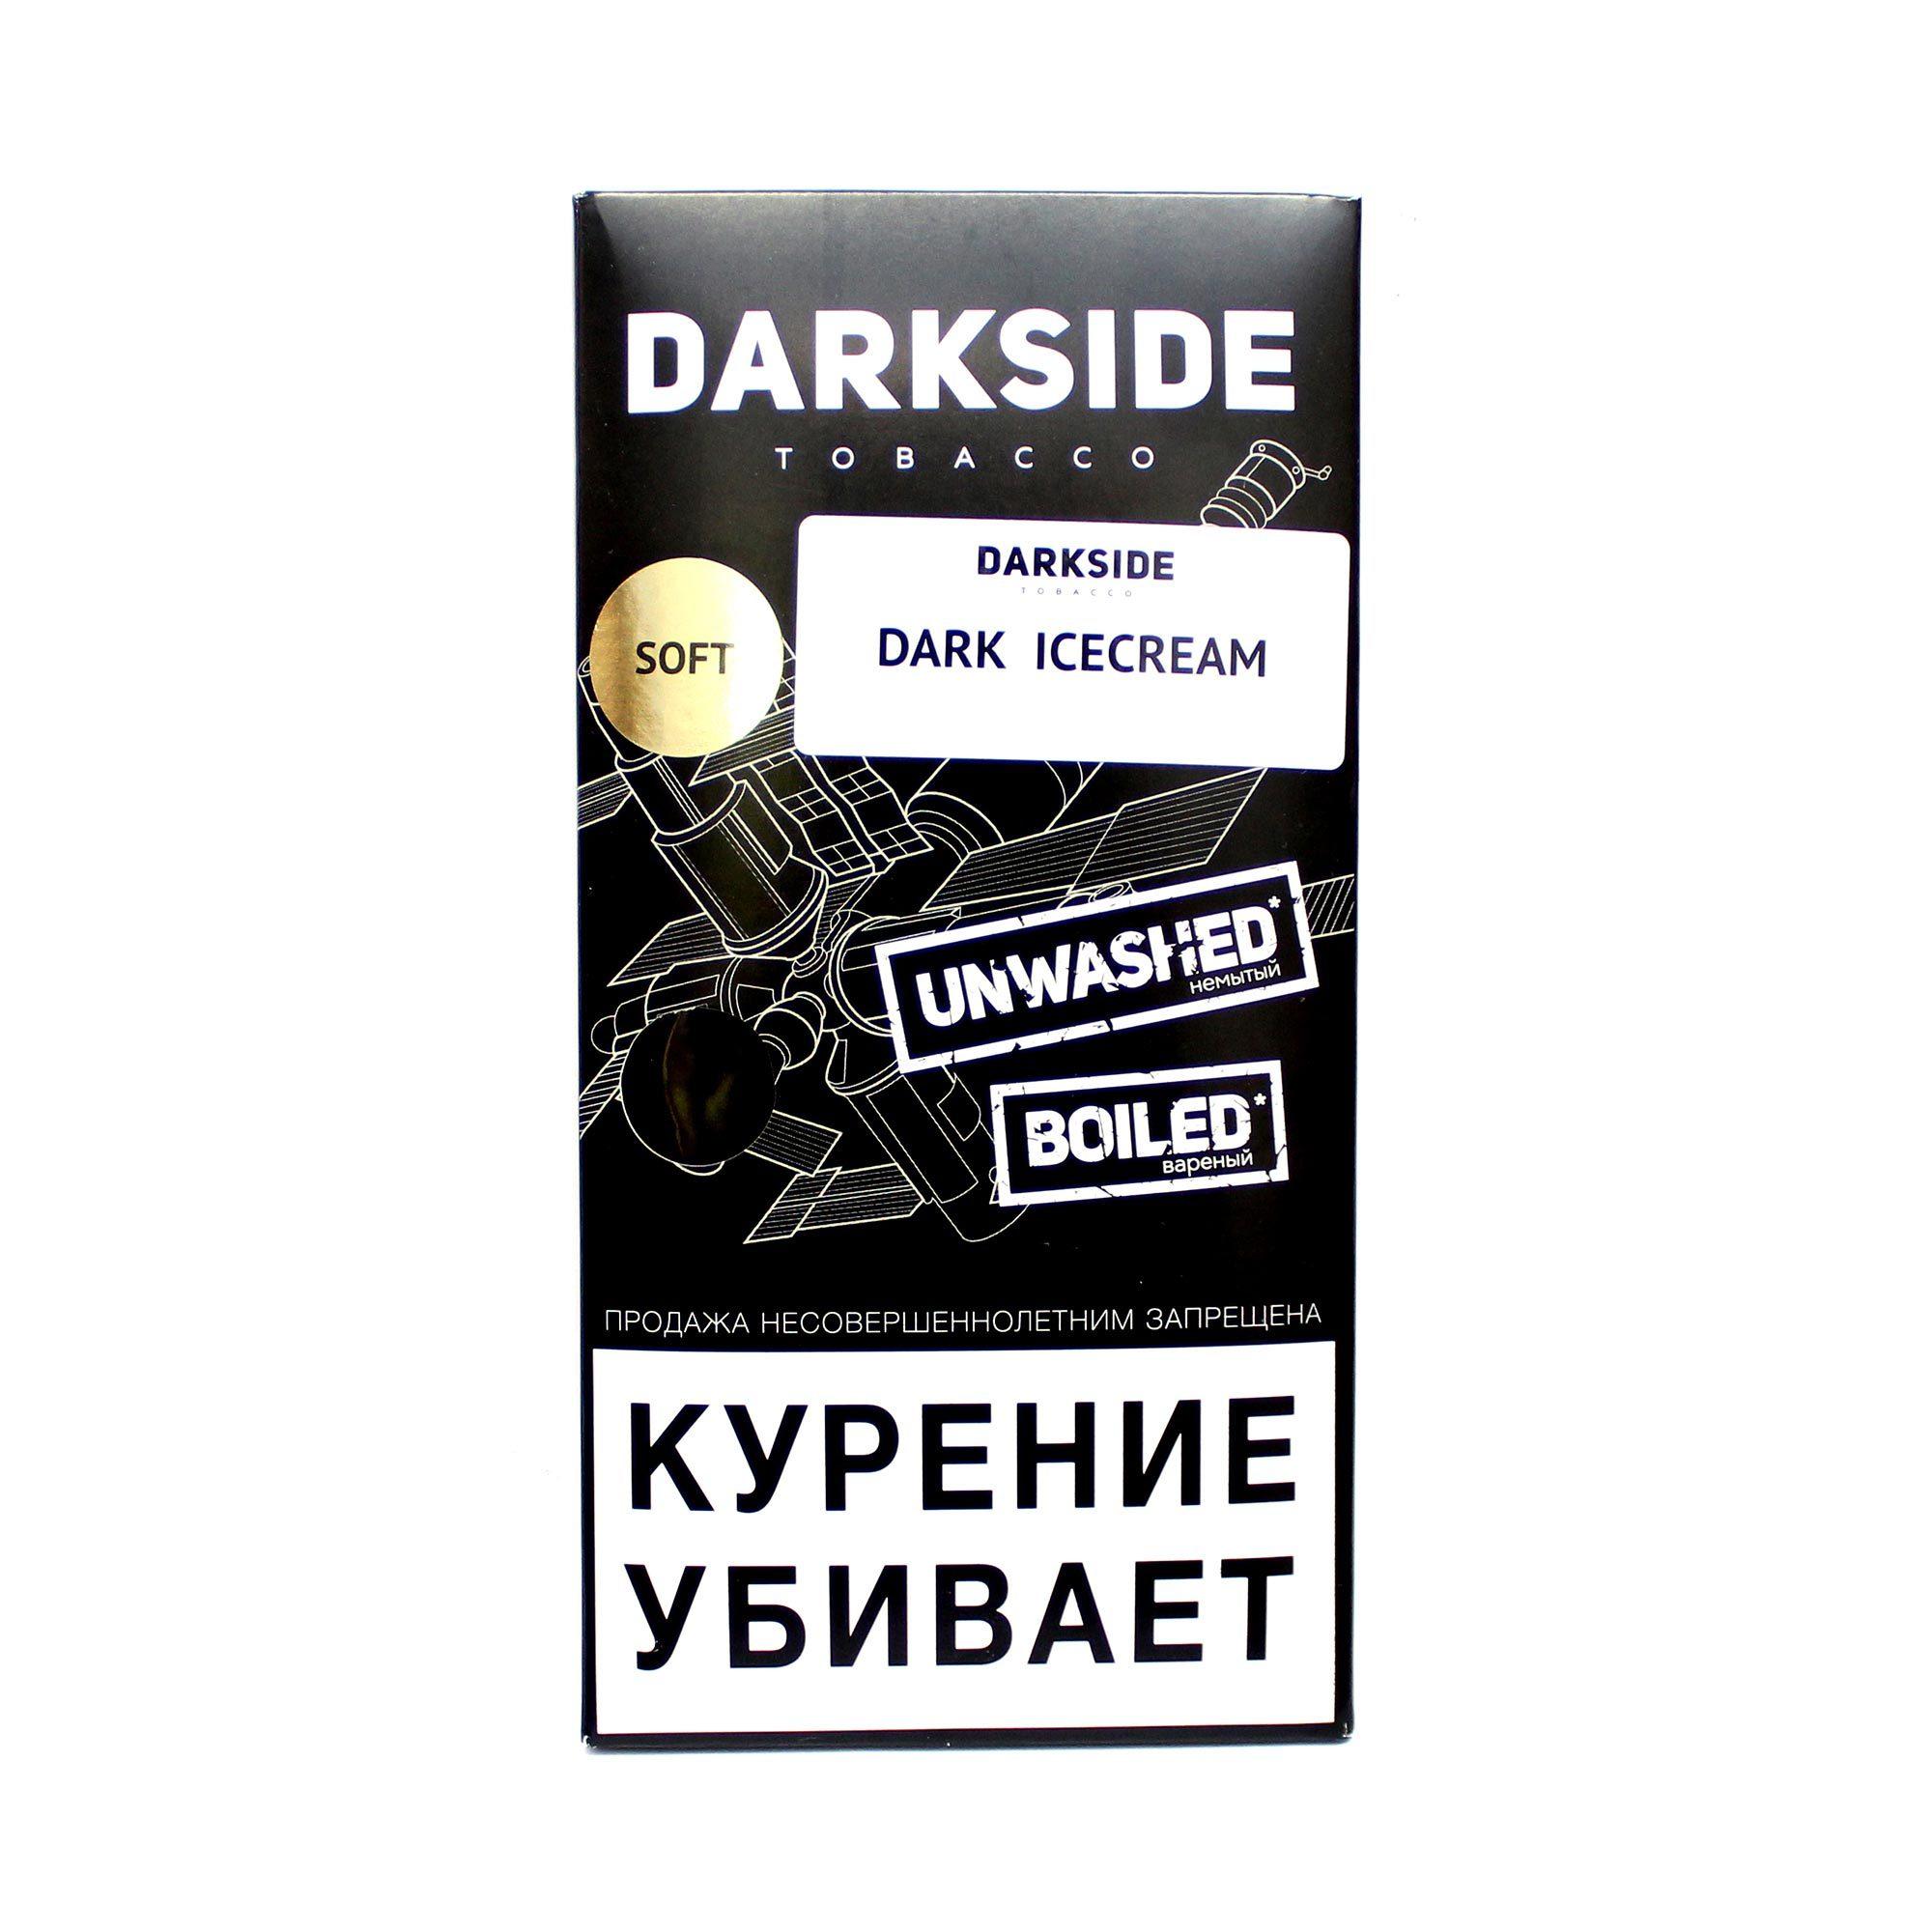 Табак для кальяна Dark Side Soft 250 гр.Dark Icecream